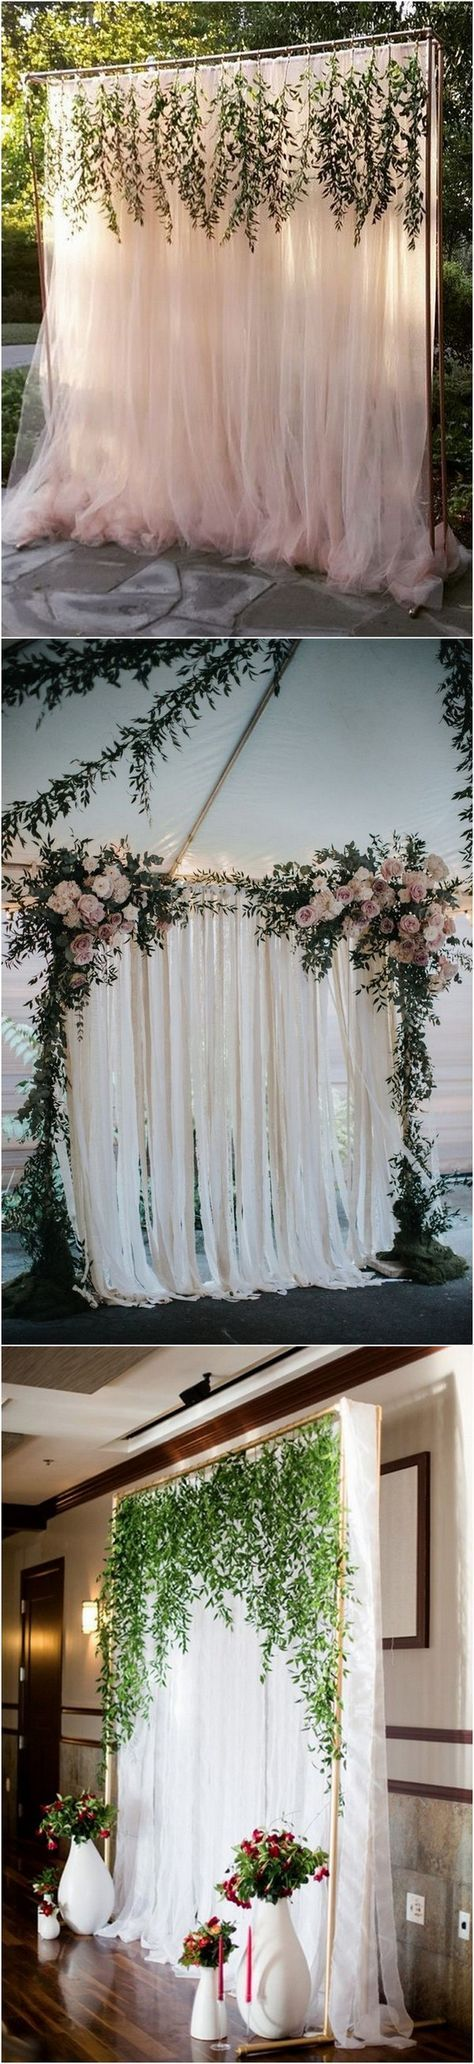 Wedding decorations shabby chic october 2018  best Wedding images on Pinterest  Wedding ideas Short wedding